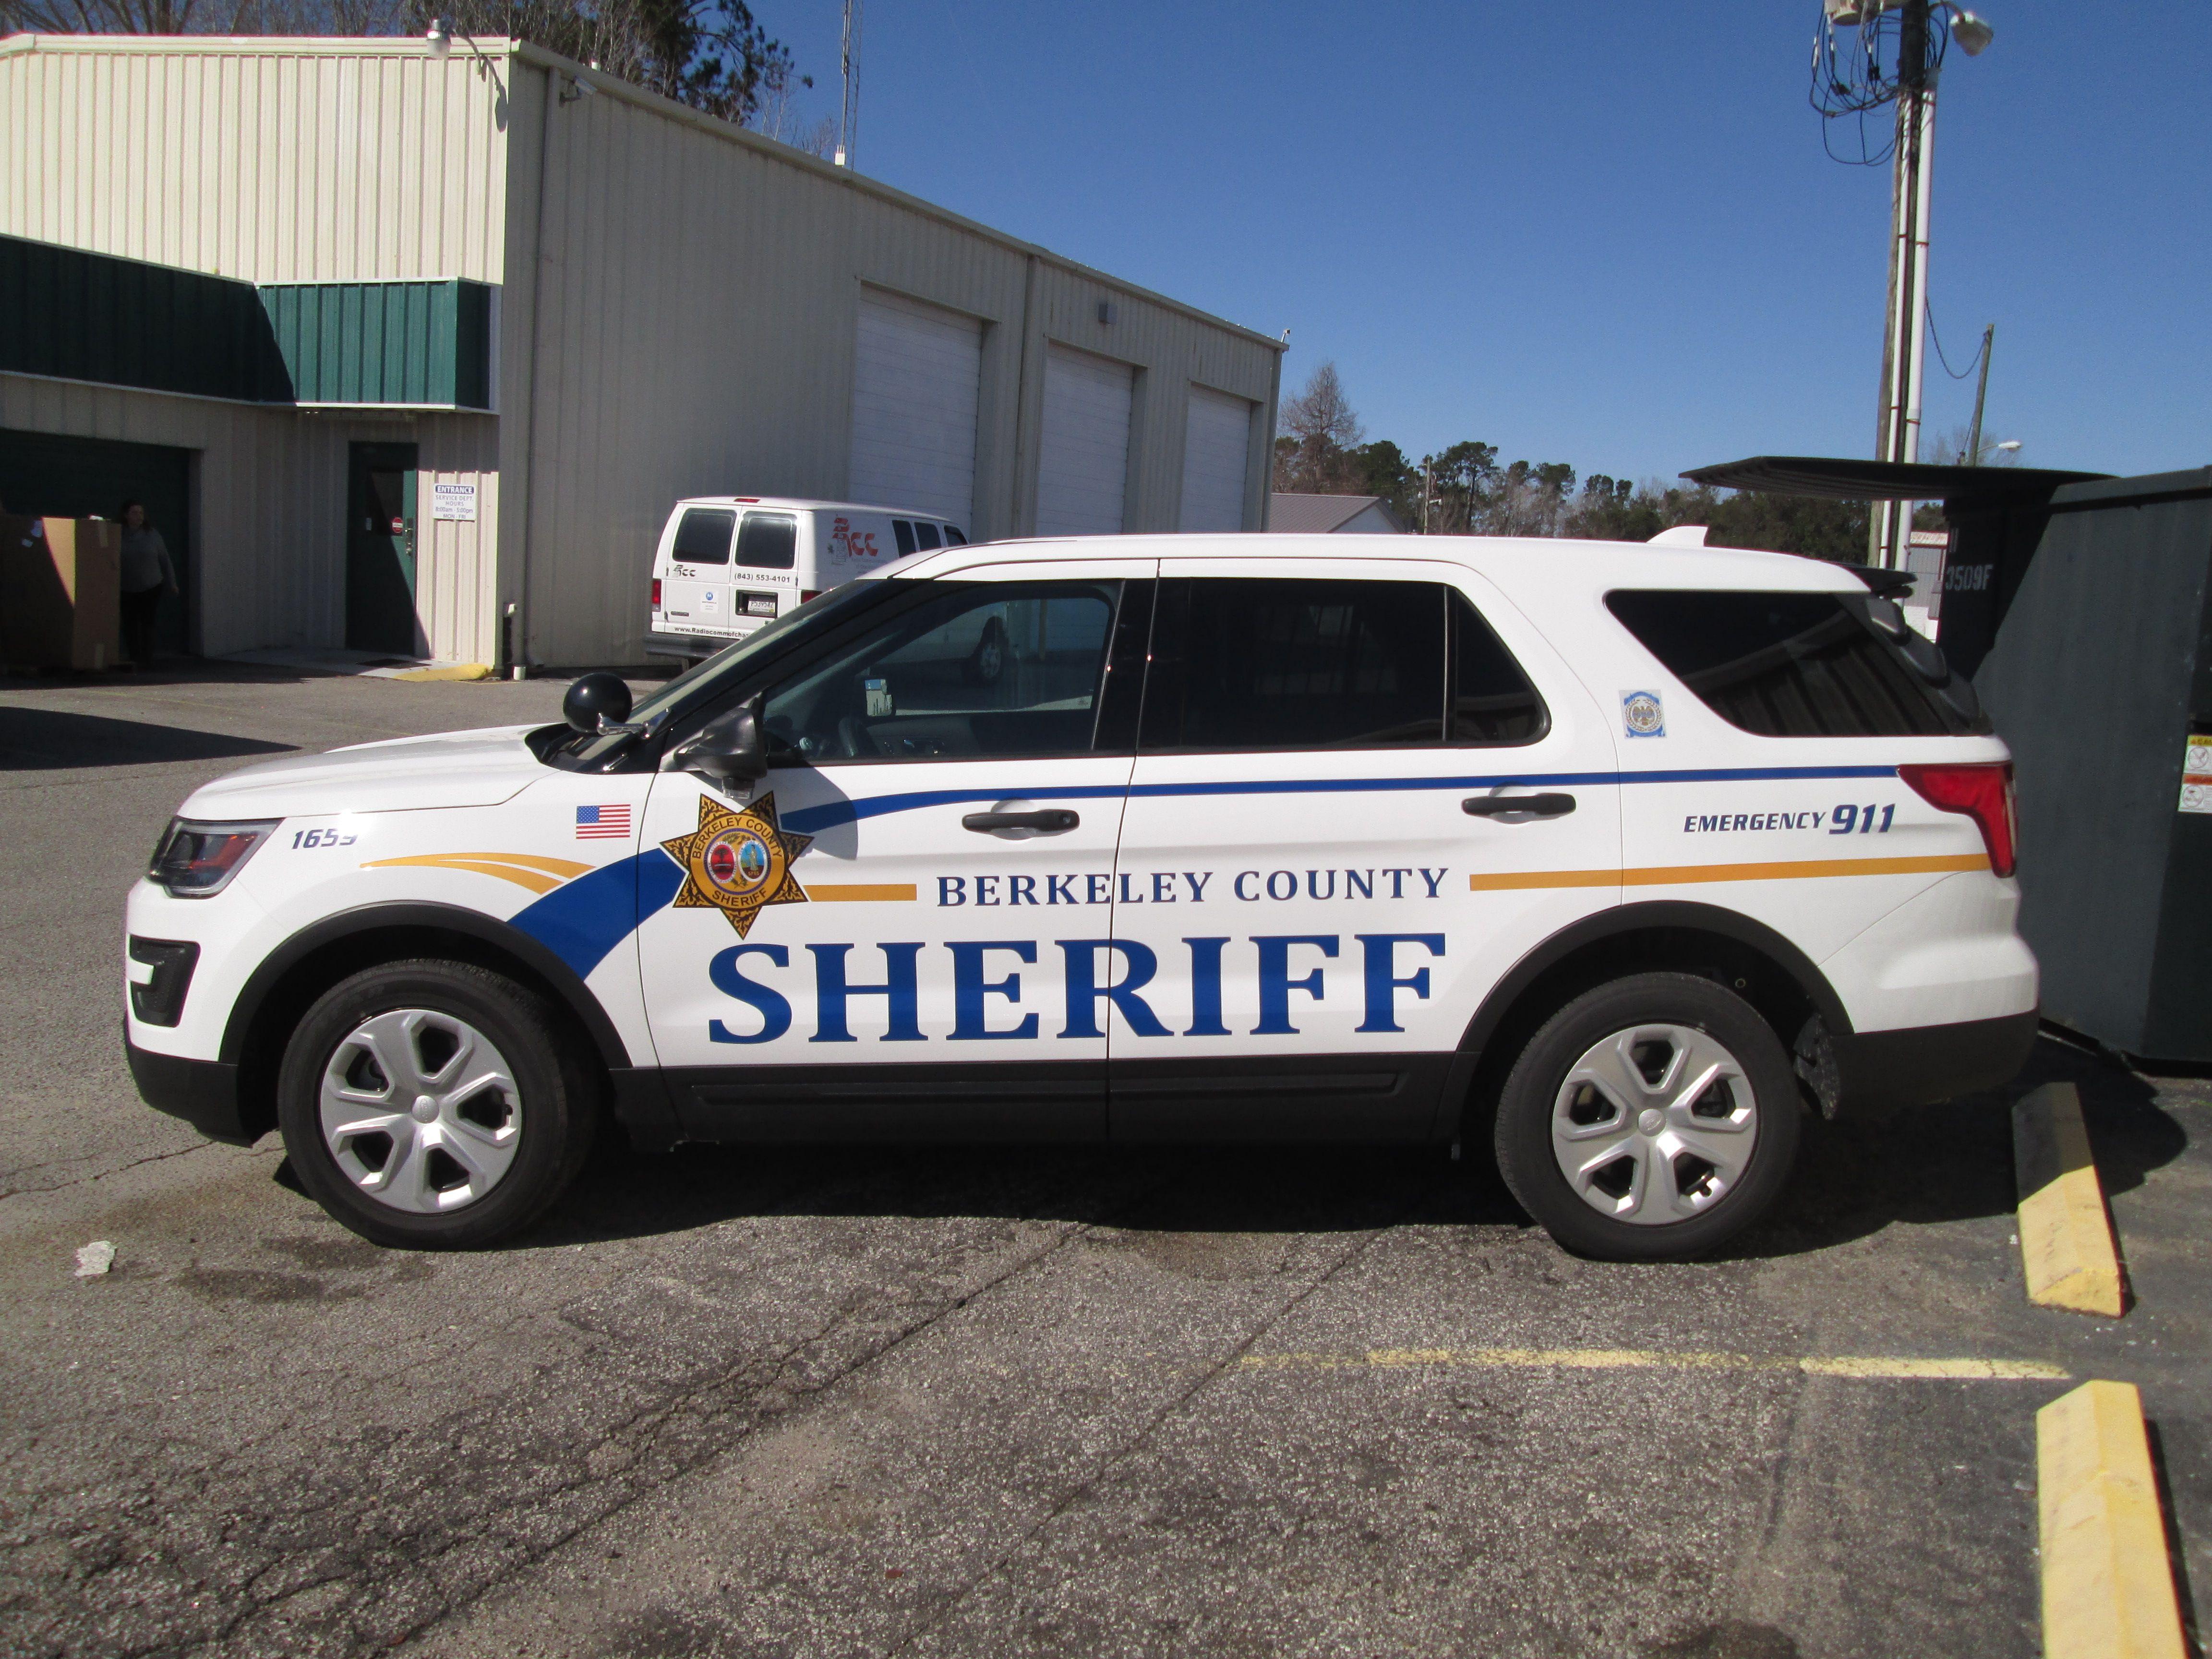 Berkeley County Sc Sheriff 1659 Ford Interceptor Utility